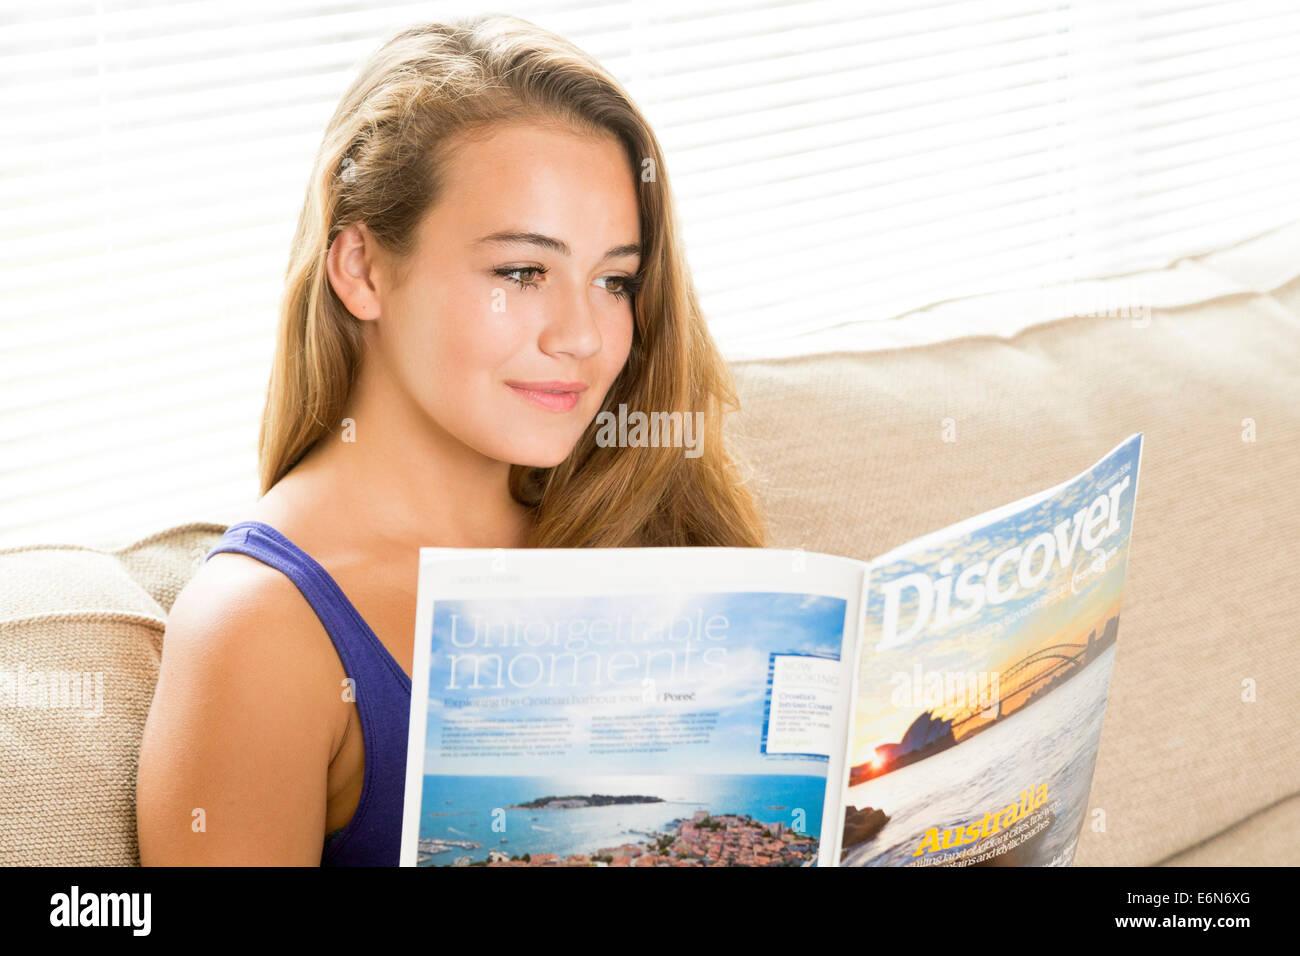 Young woman reading maison de vacances / vacation brochure Photo Stock